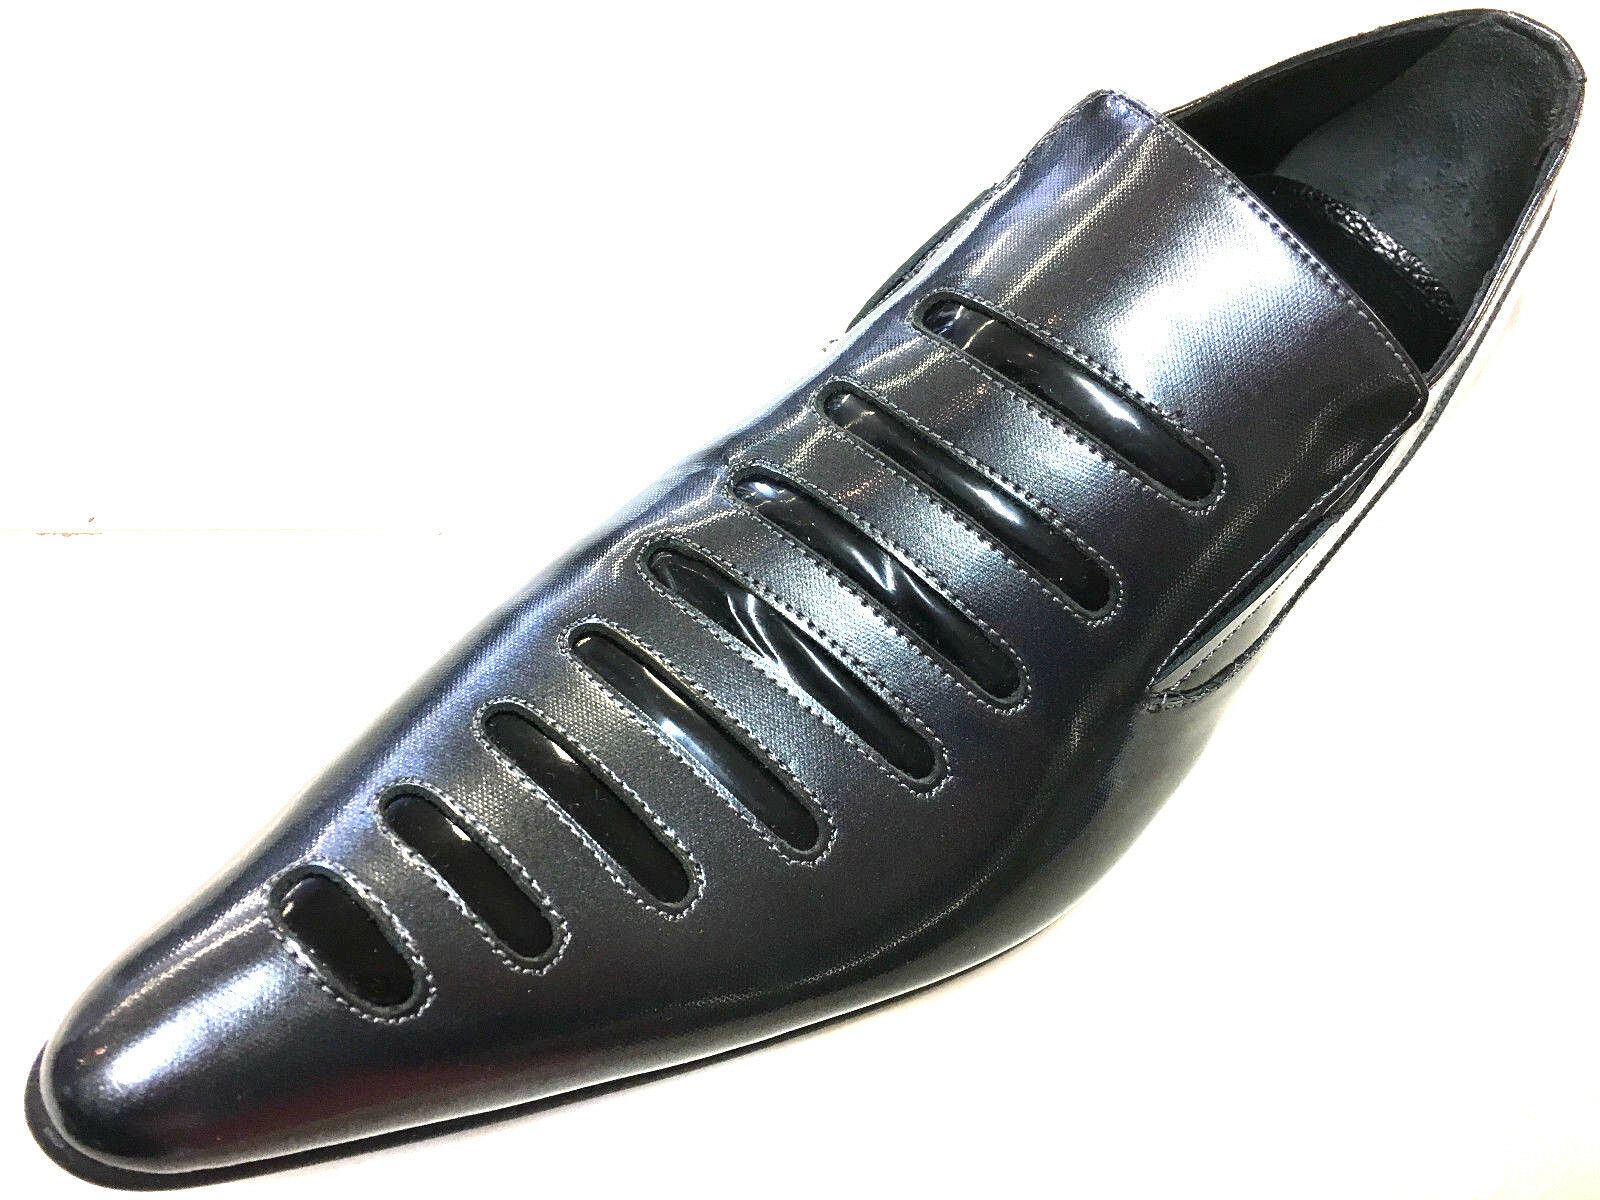 Chelsy insoliti in Pelle Uomo Scarpe Grigio Nero ANTRAZIT Designer Designer Designer Slipper 40 3167a7